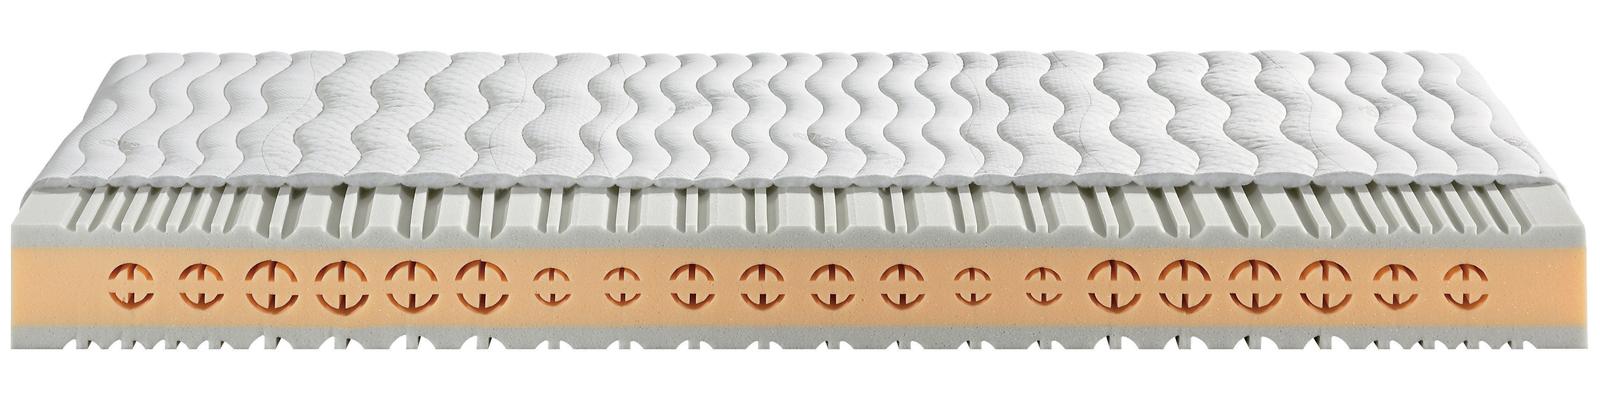 axel bloom sofa throw covers ikea mattresses dw 800 german adjustable bed model no